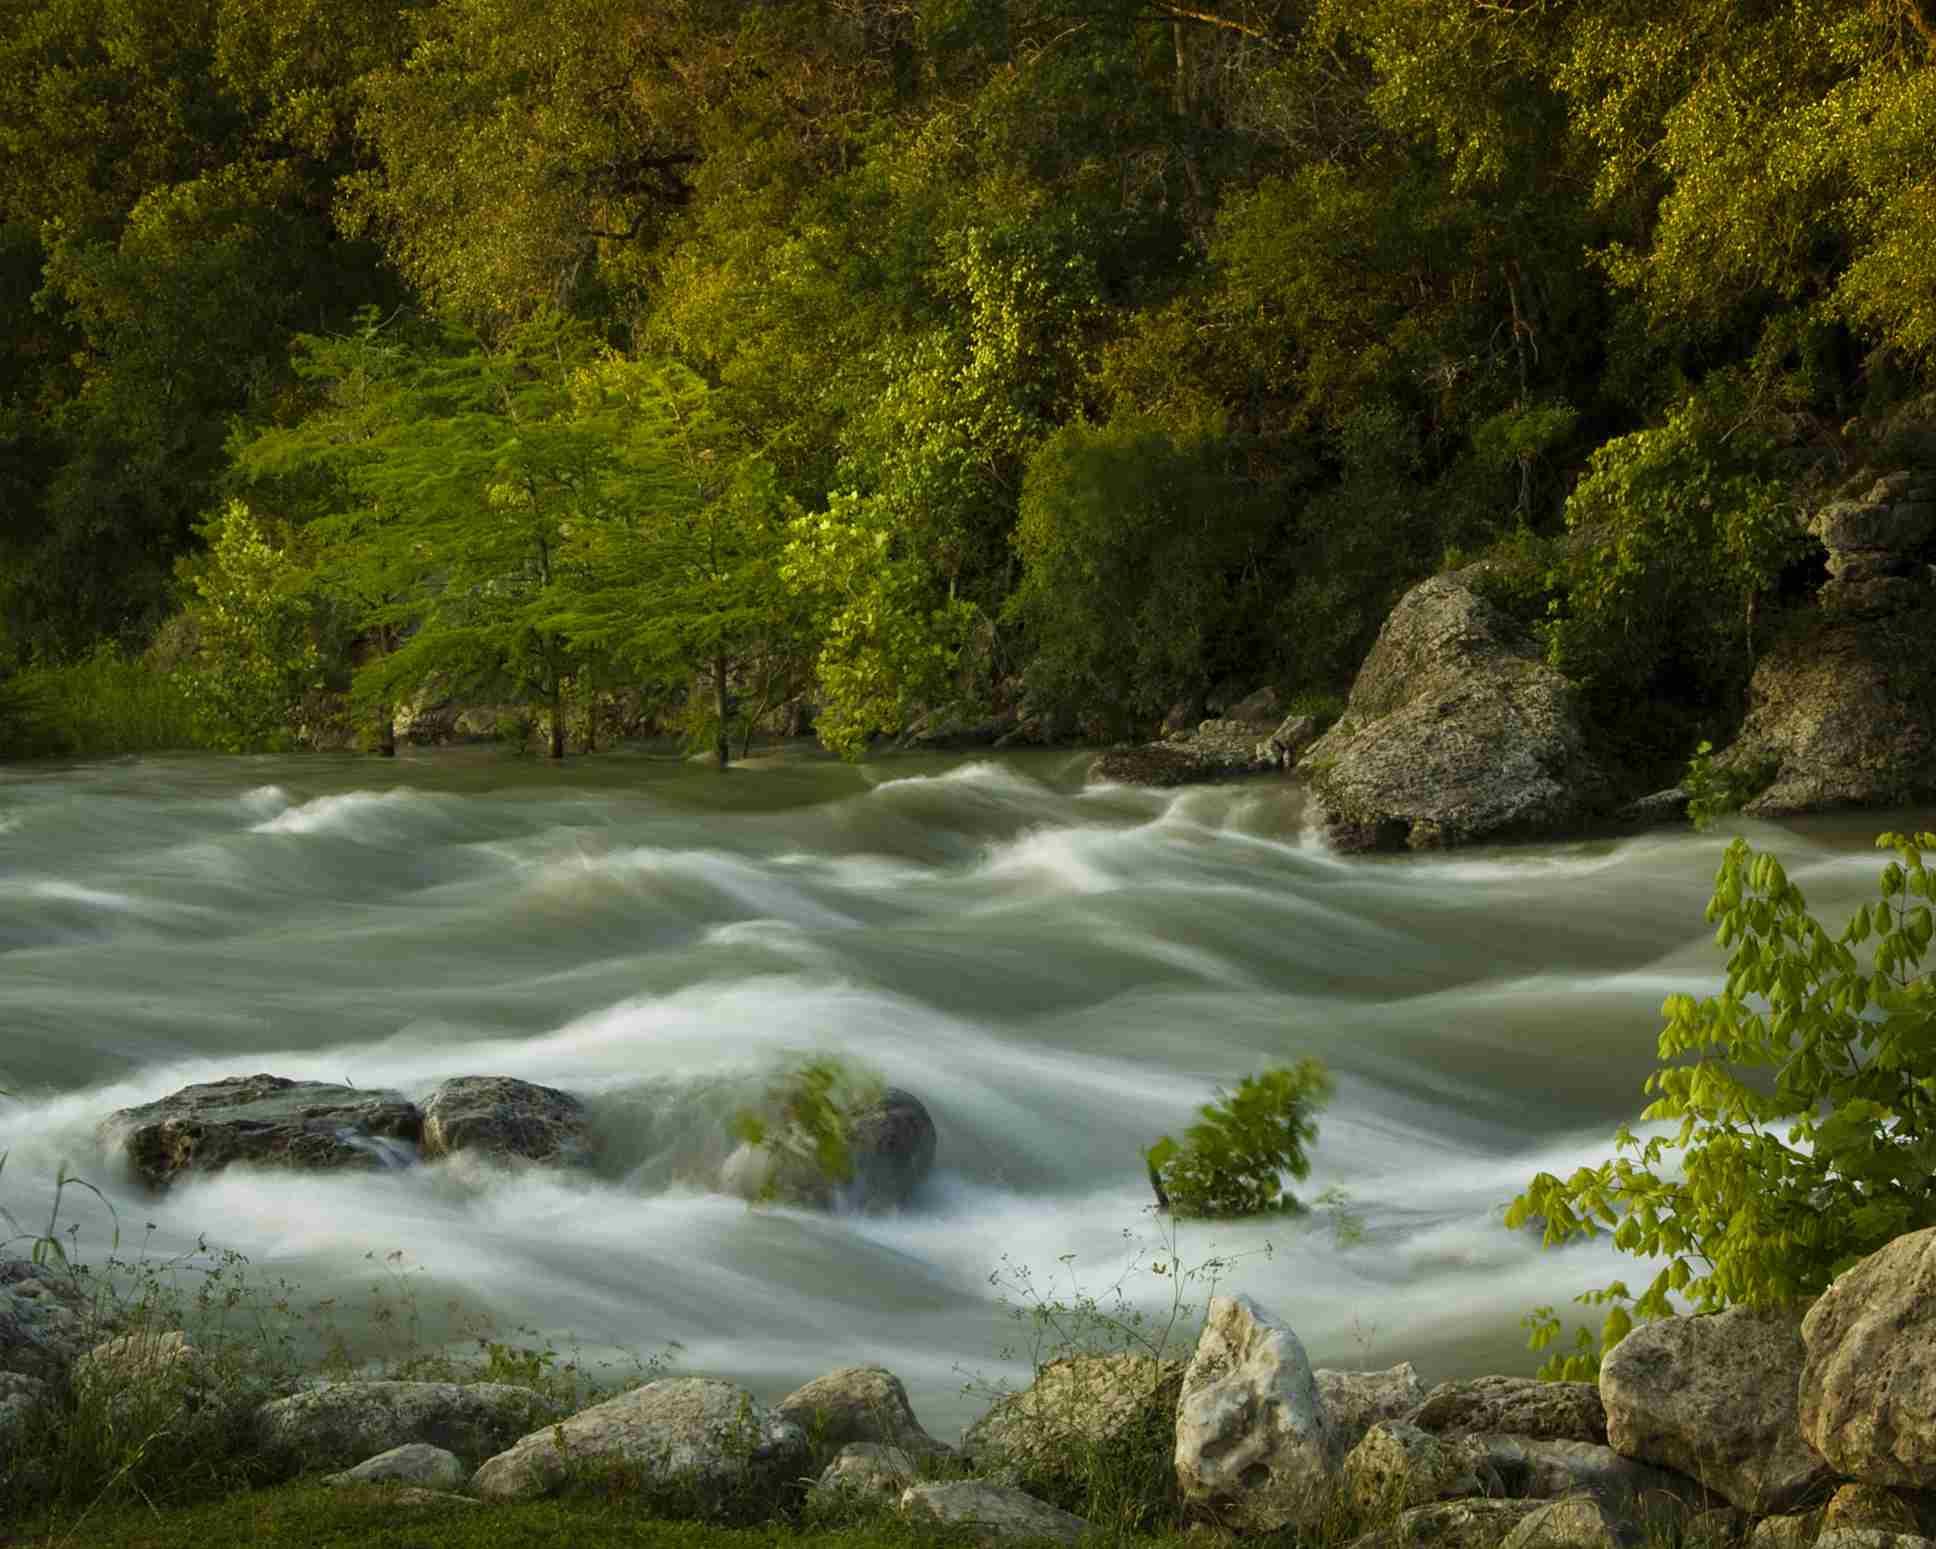 Guadalupe river, Gruene, Texas, USA.